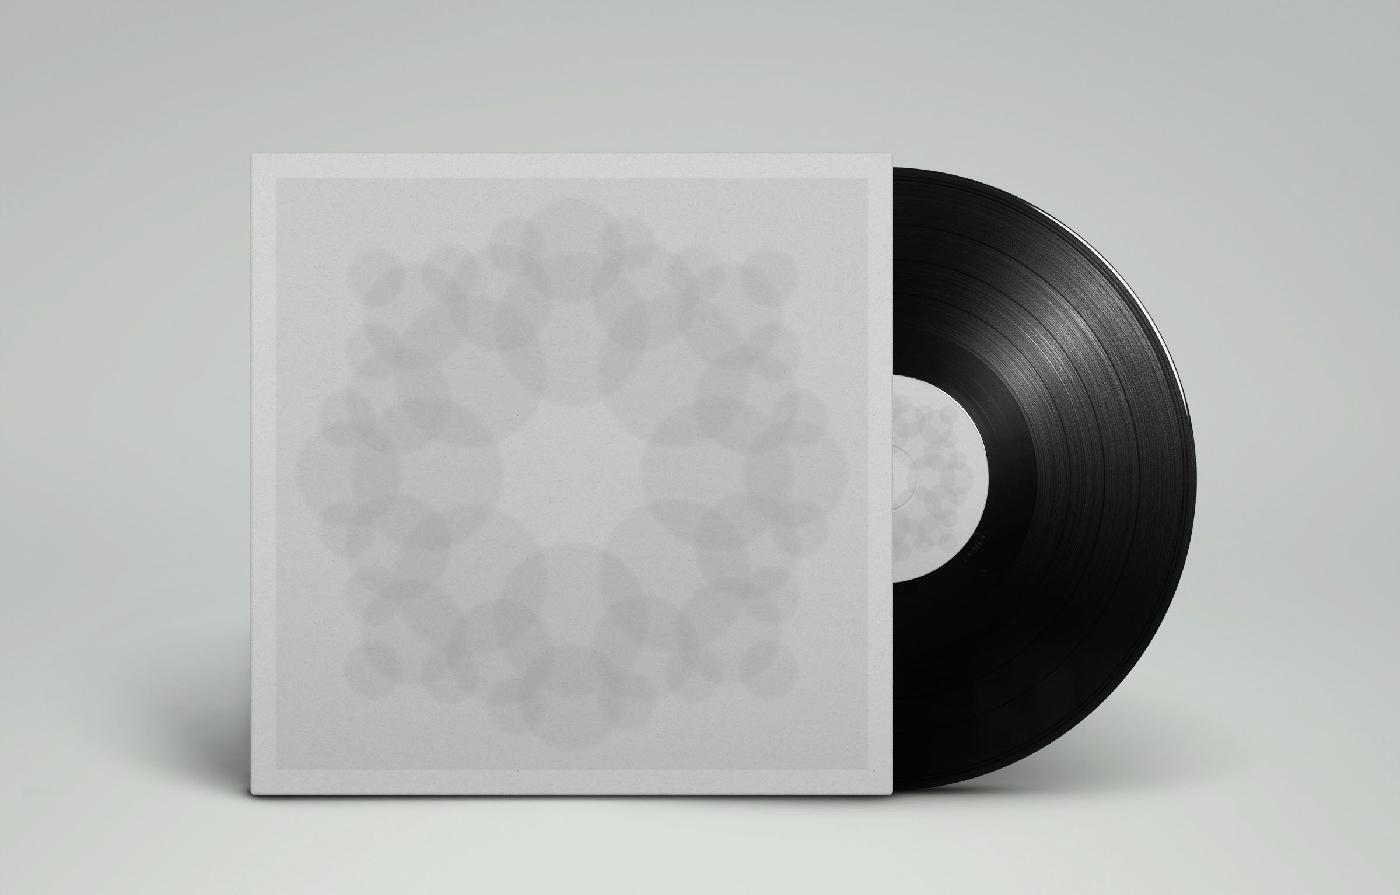 Max Richter - Dream 3 - sleeve 2